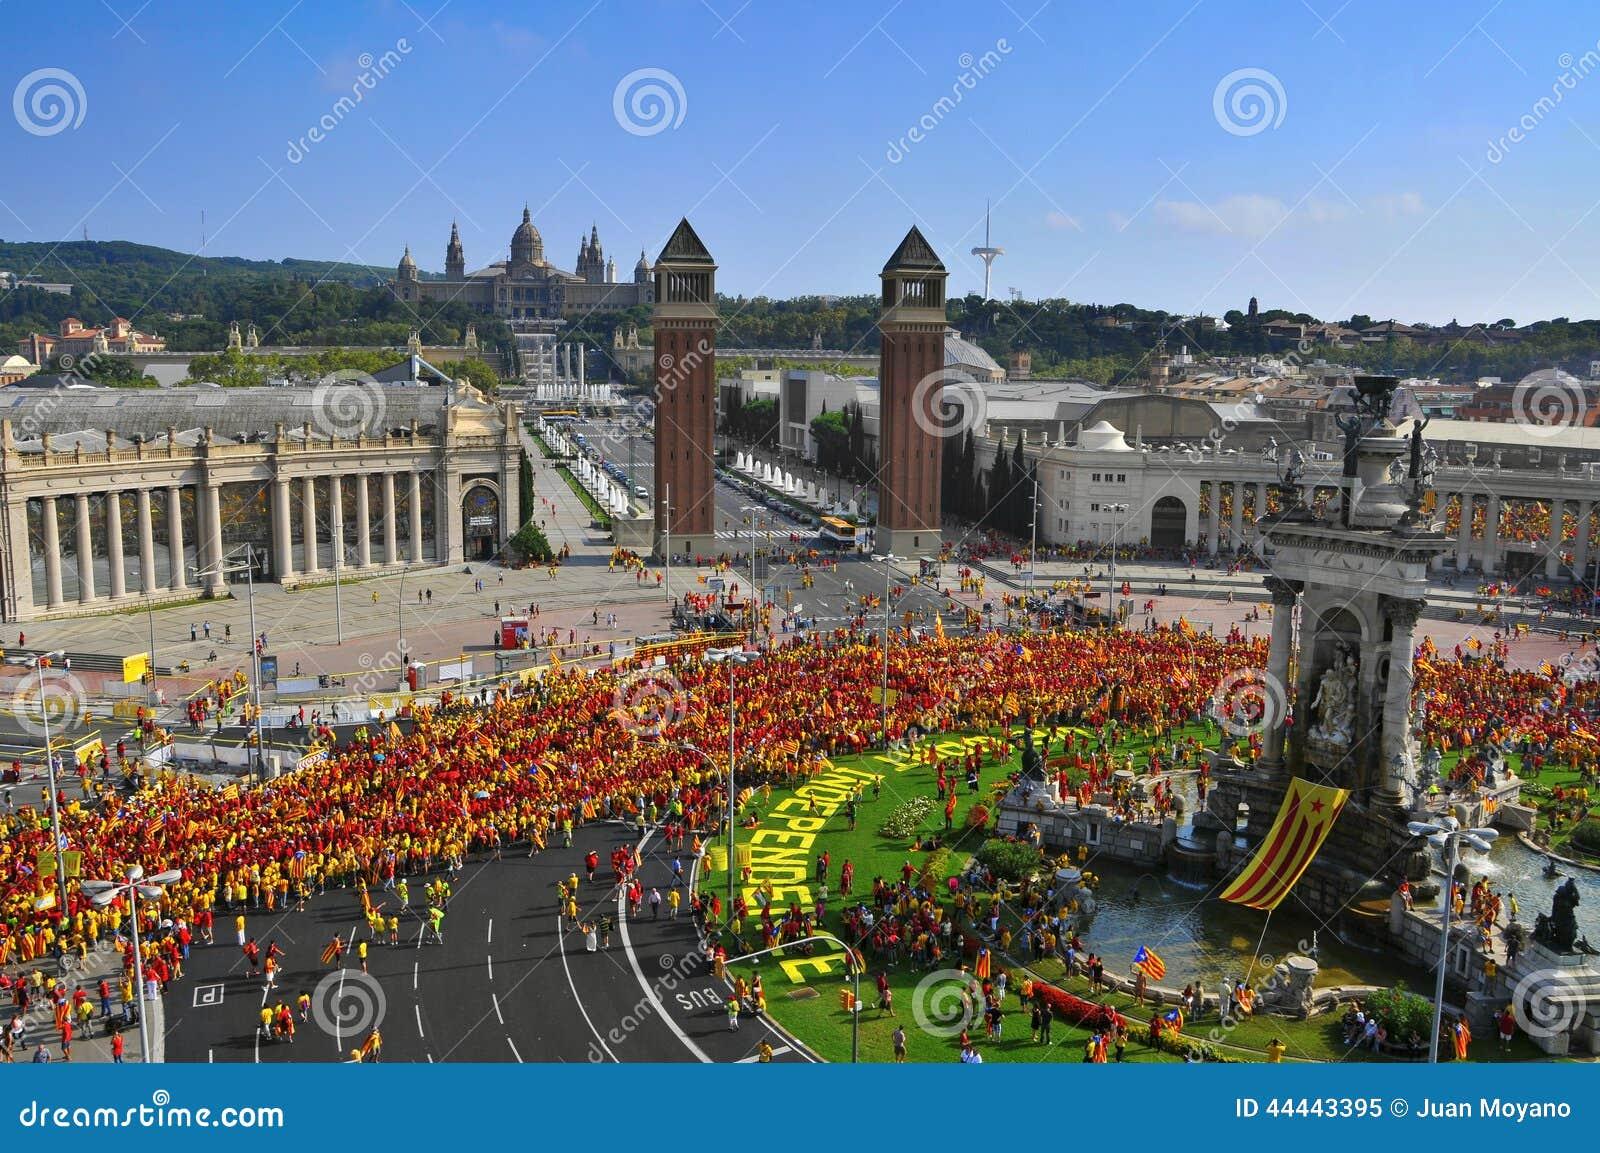 Hotel Catalonia Park Guell Barcelona Spain